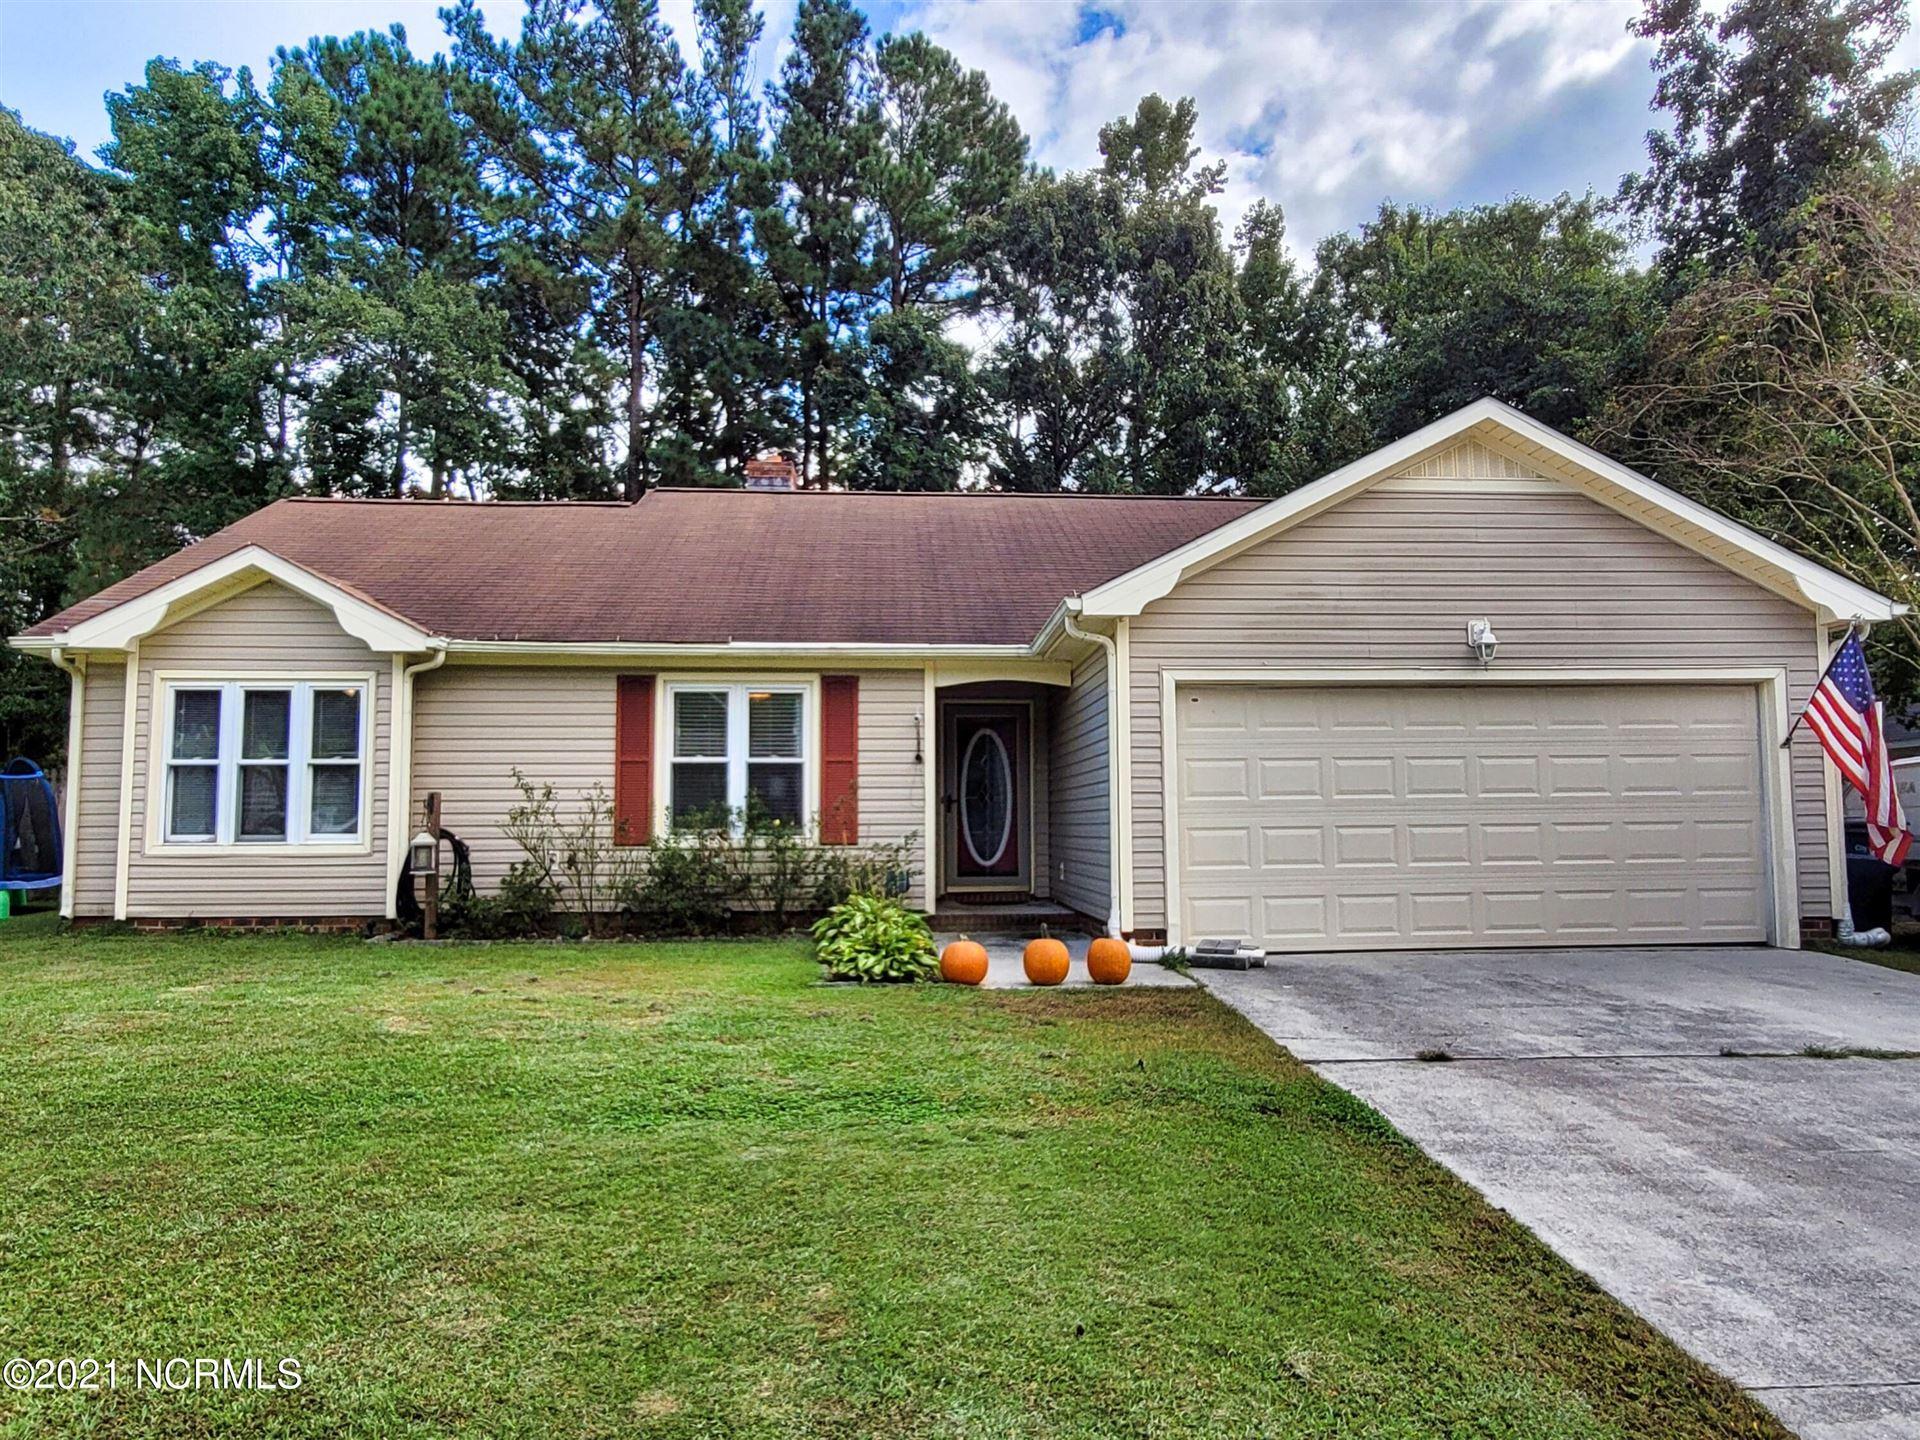 Photo of 212 Audubon Drive, Jacksonville, NC 28546 (MLS # 100292590)